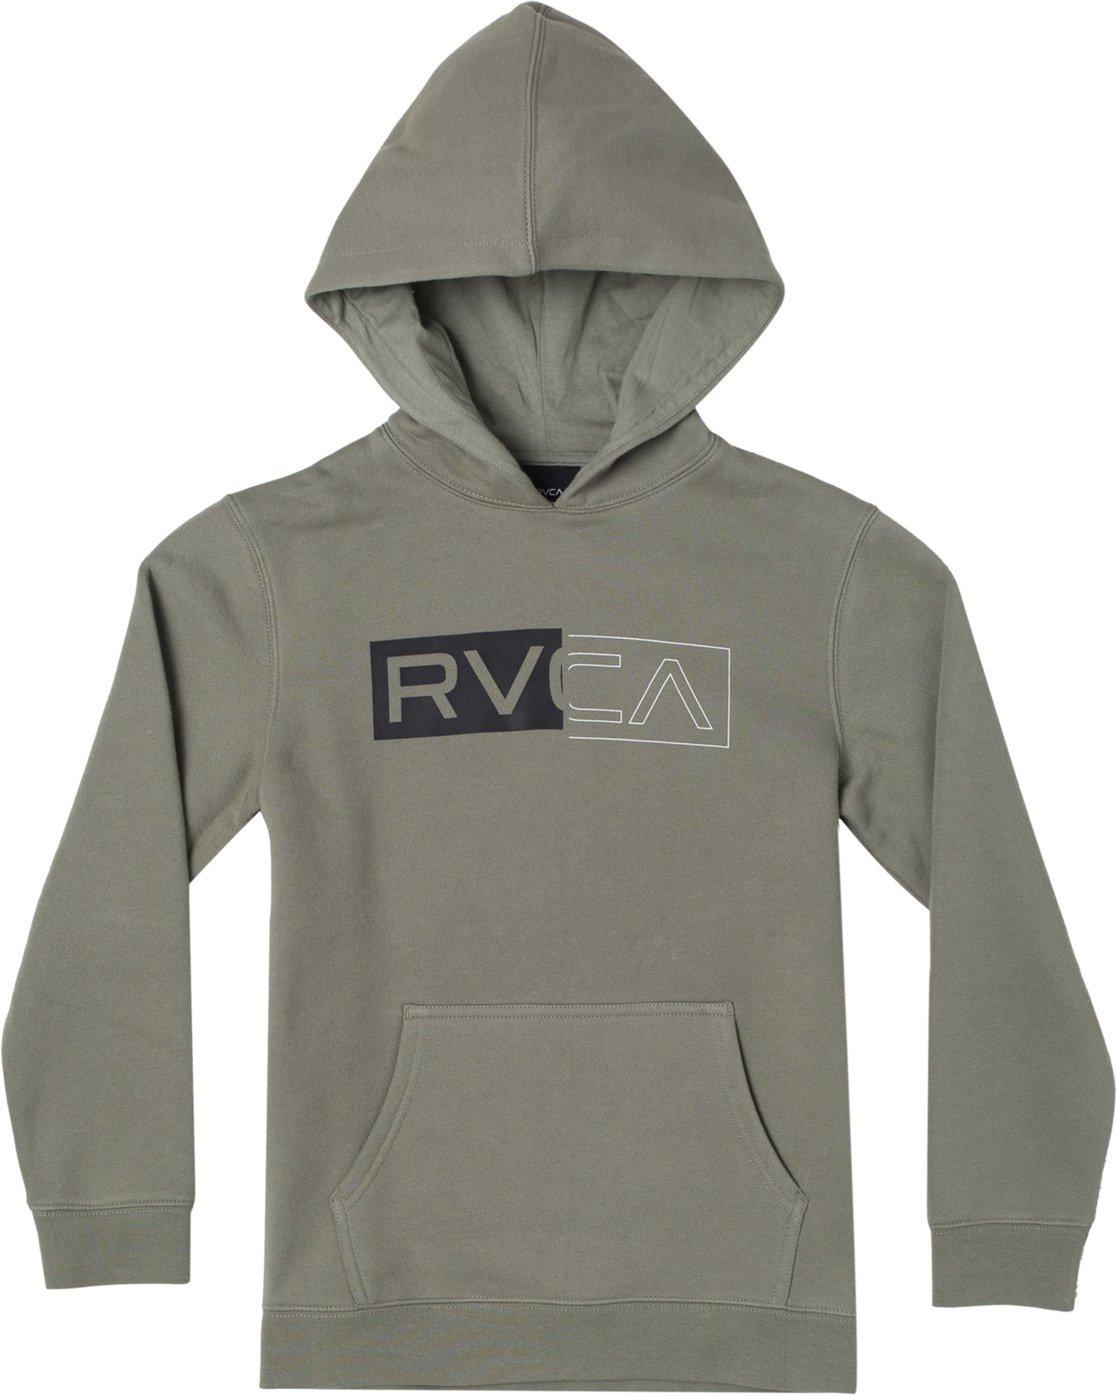 0 DIVIDED HOODIE Green AVBFT00101 RVCA